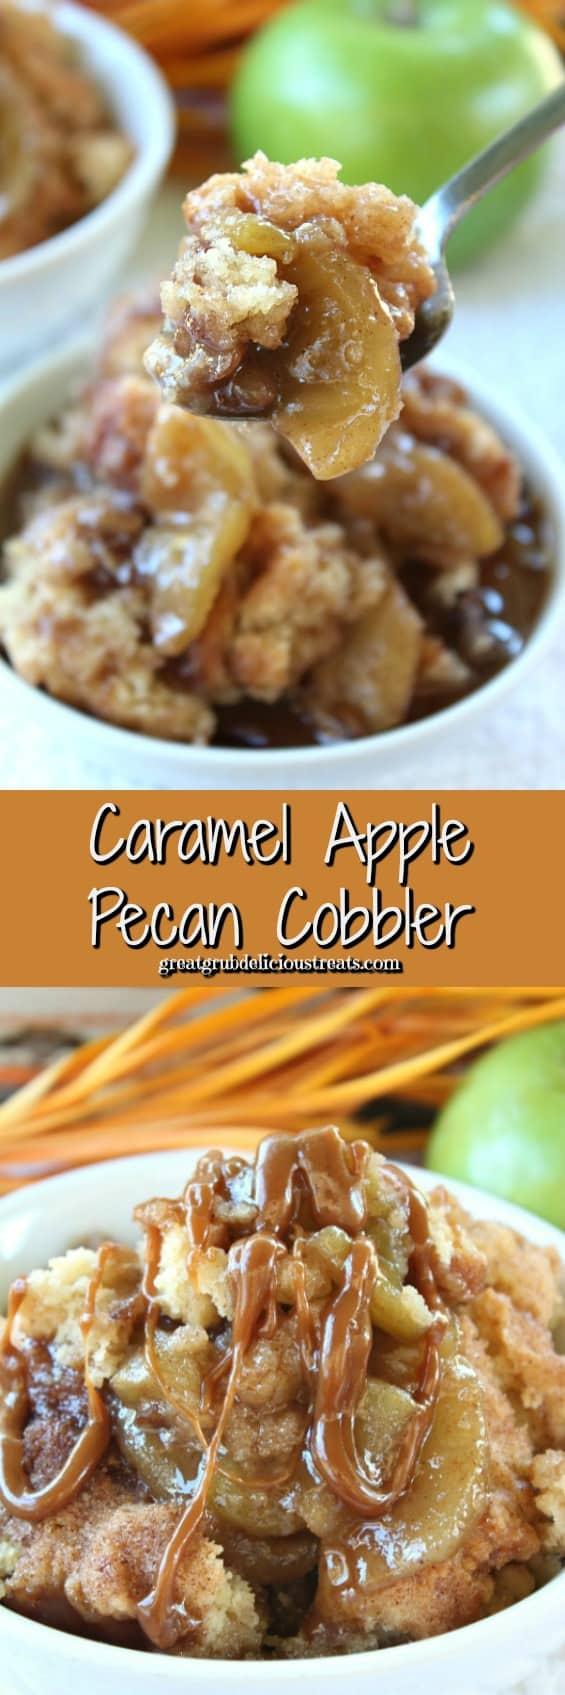 Caramel Apple Pecan Cobbler